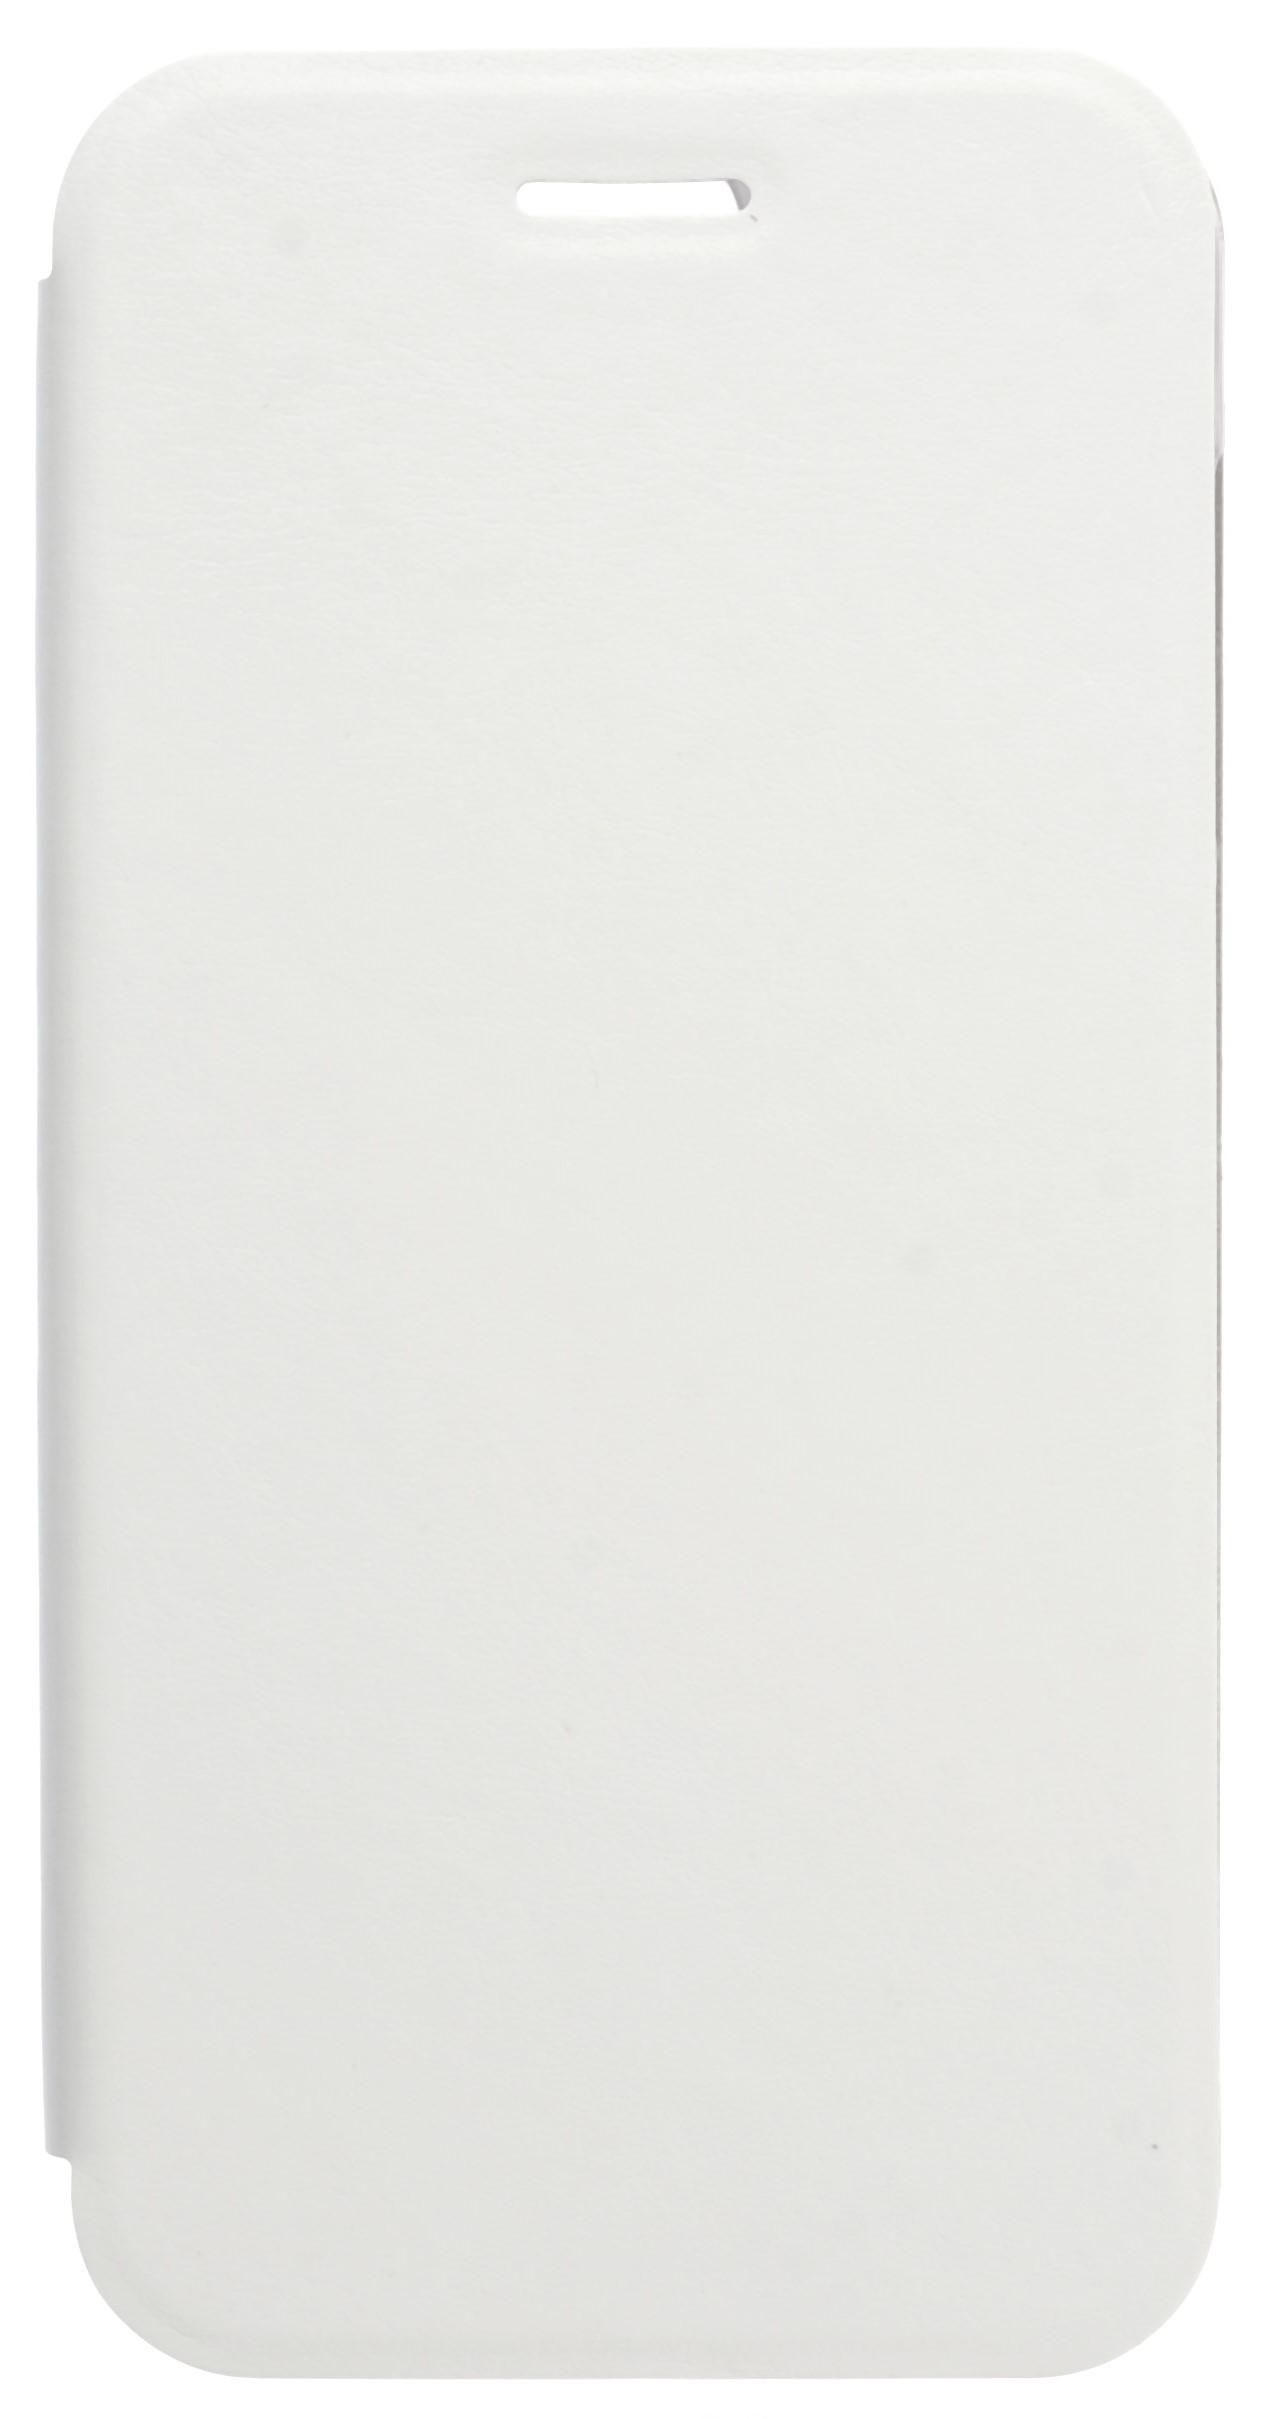 Чехол для сотового телефона skinBOX Lux, 4630042527645, белый nokia cc 3096 чехол для lumia 435 532 bright orange